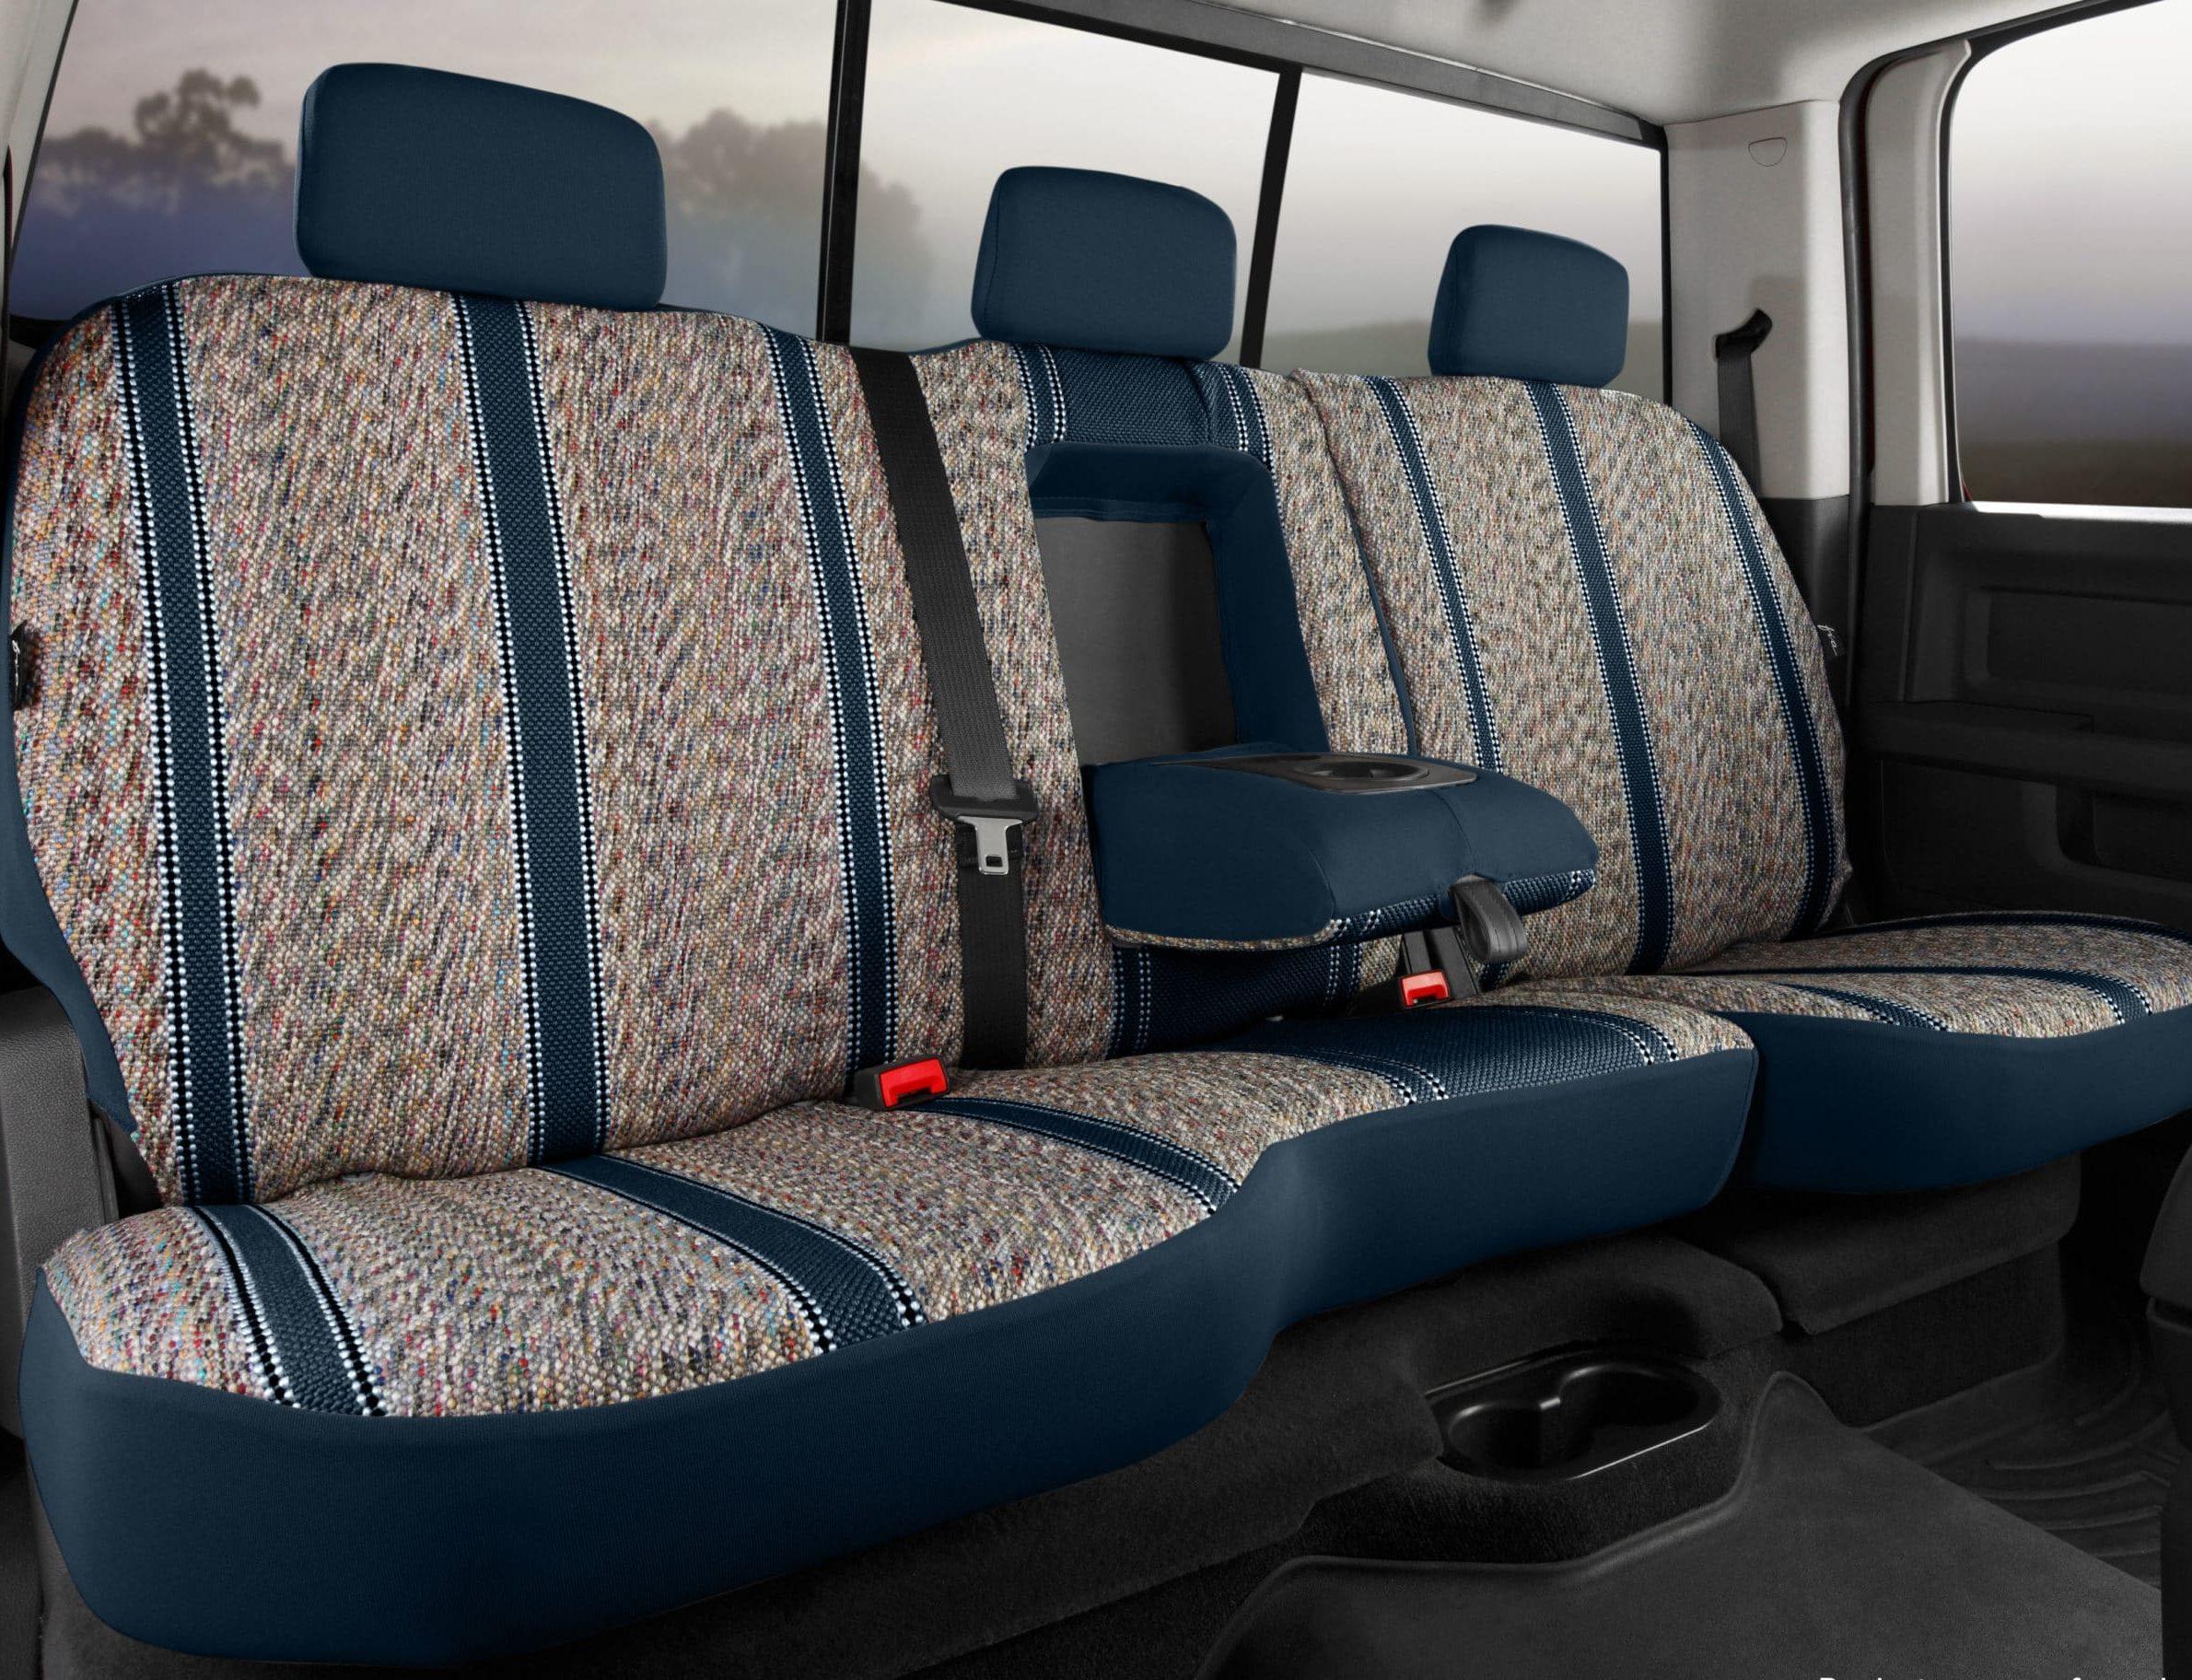 Fia Original Wrangler Seat Covers - Navy - Rear Seats